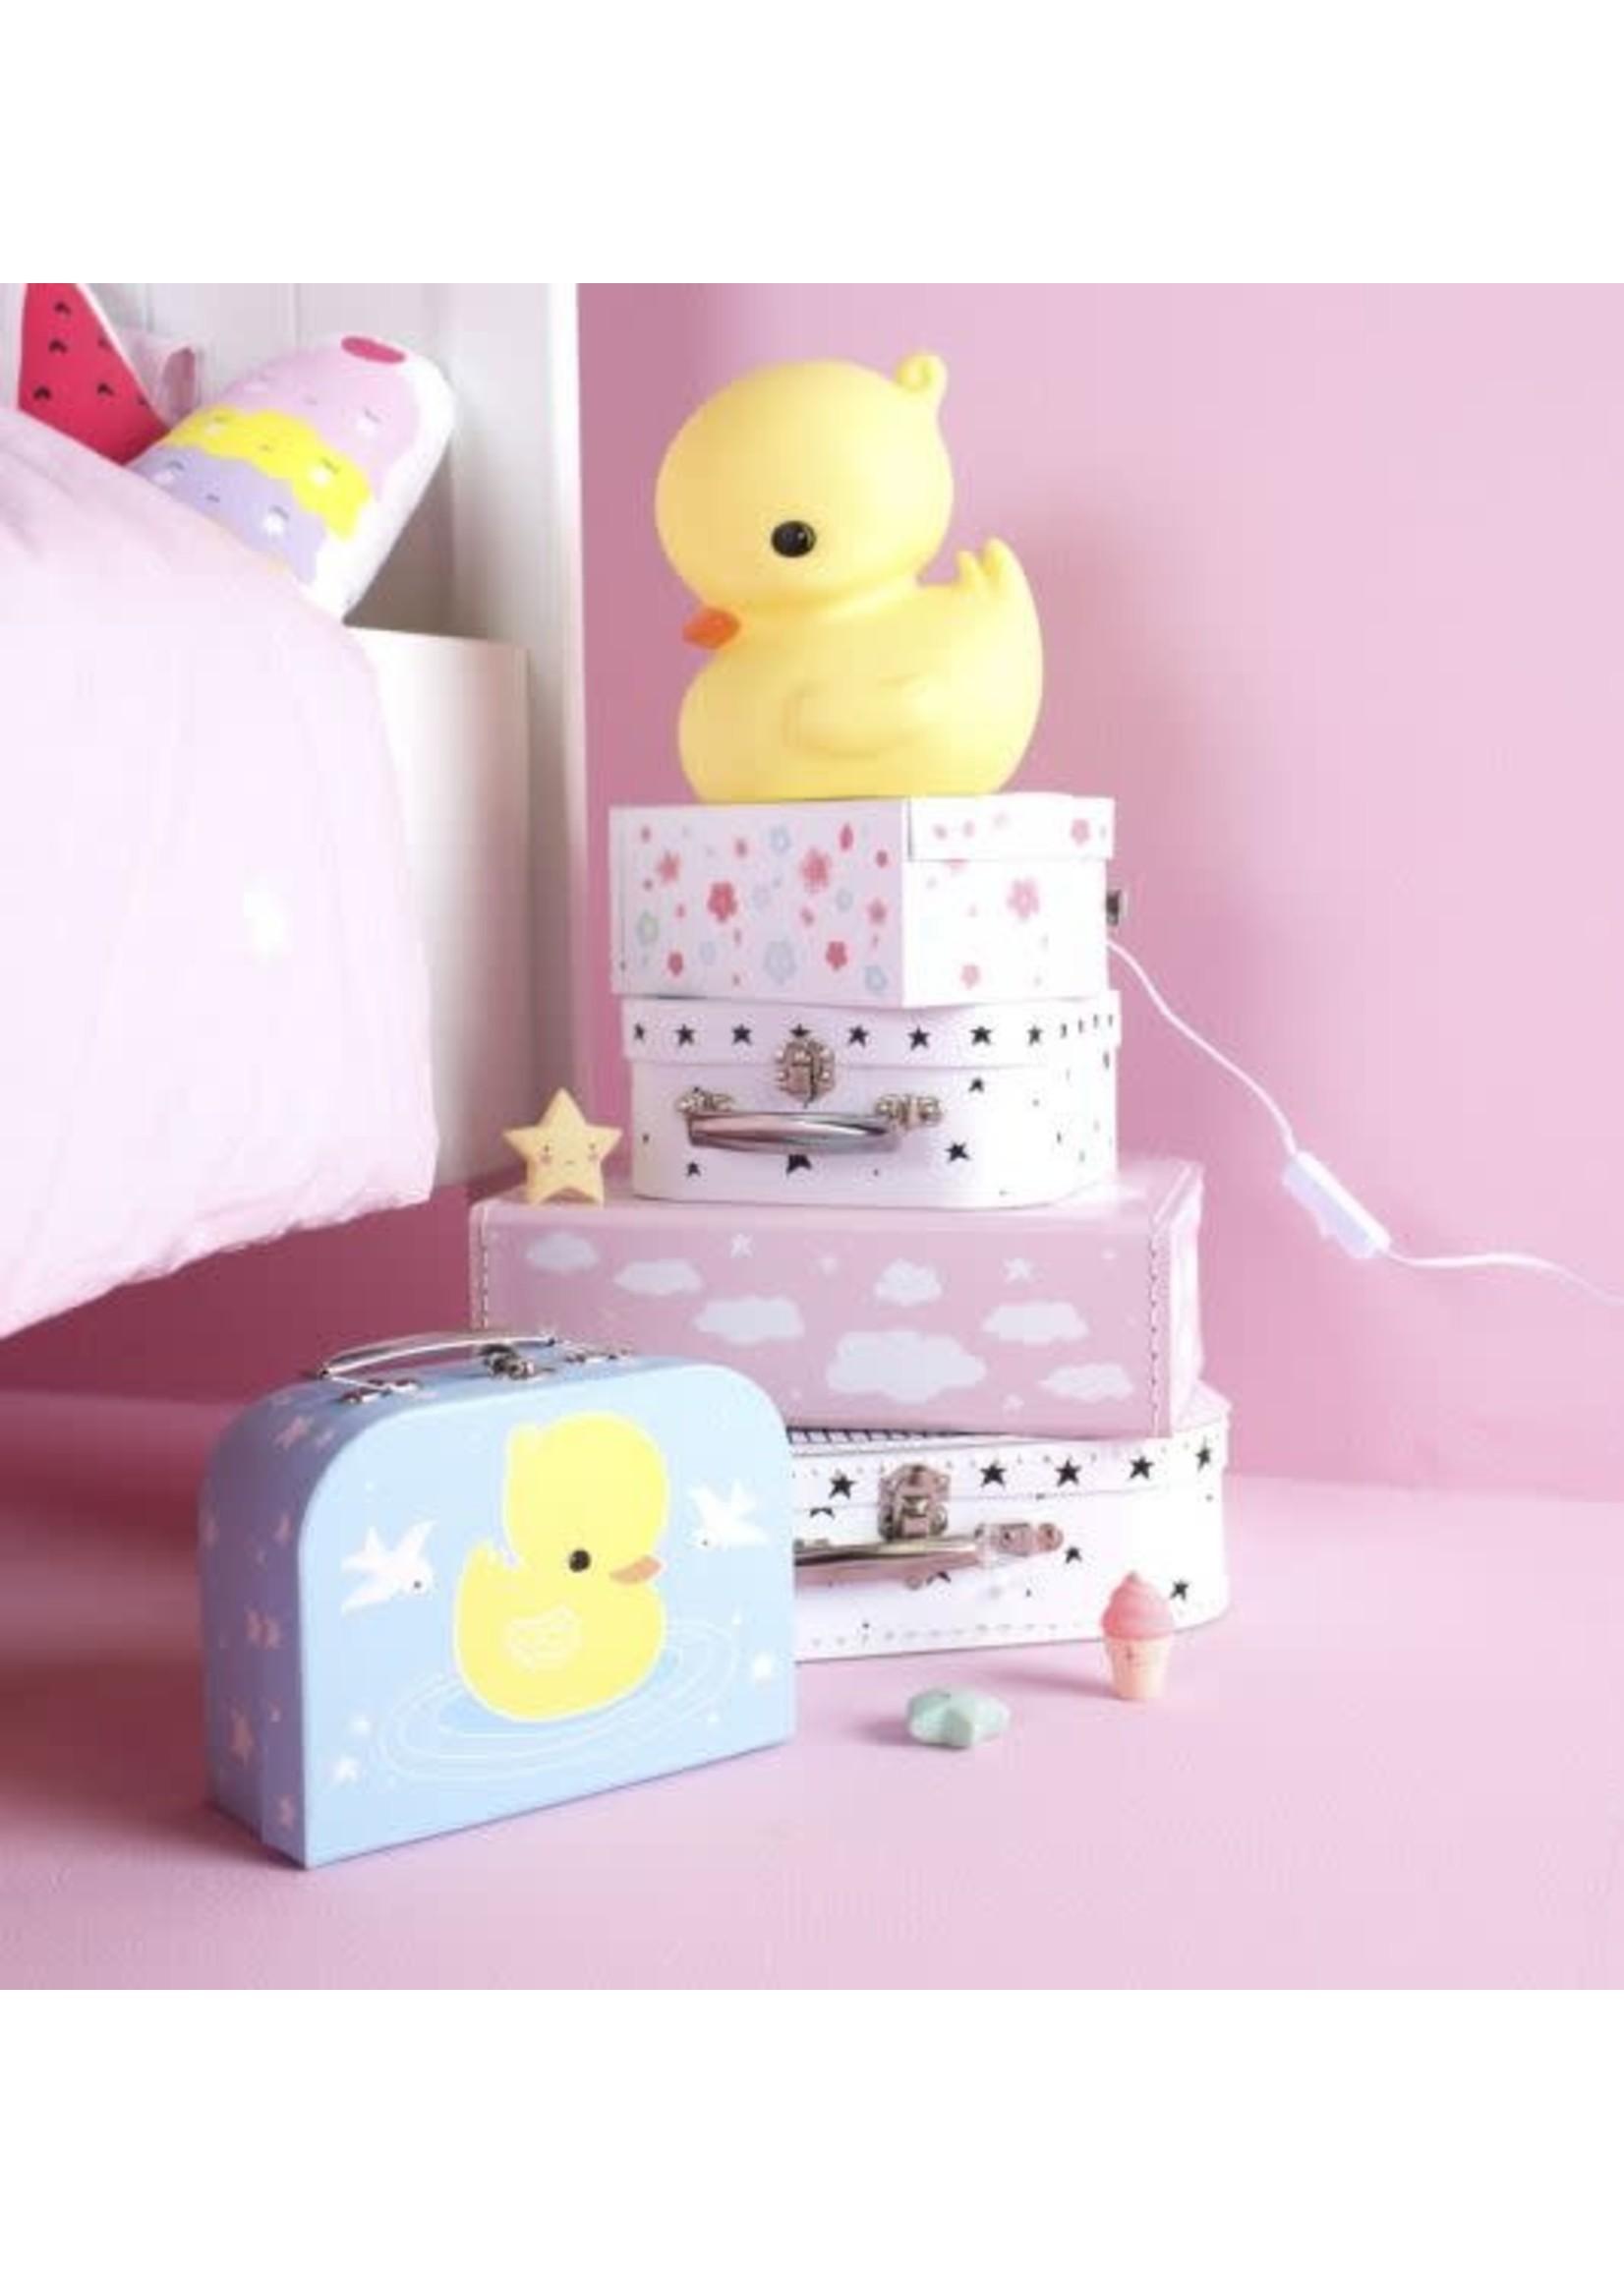 A Little Lovely Co. Little Lovely Company Table Light (Duck)